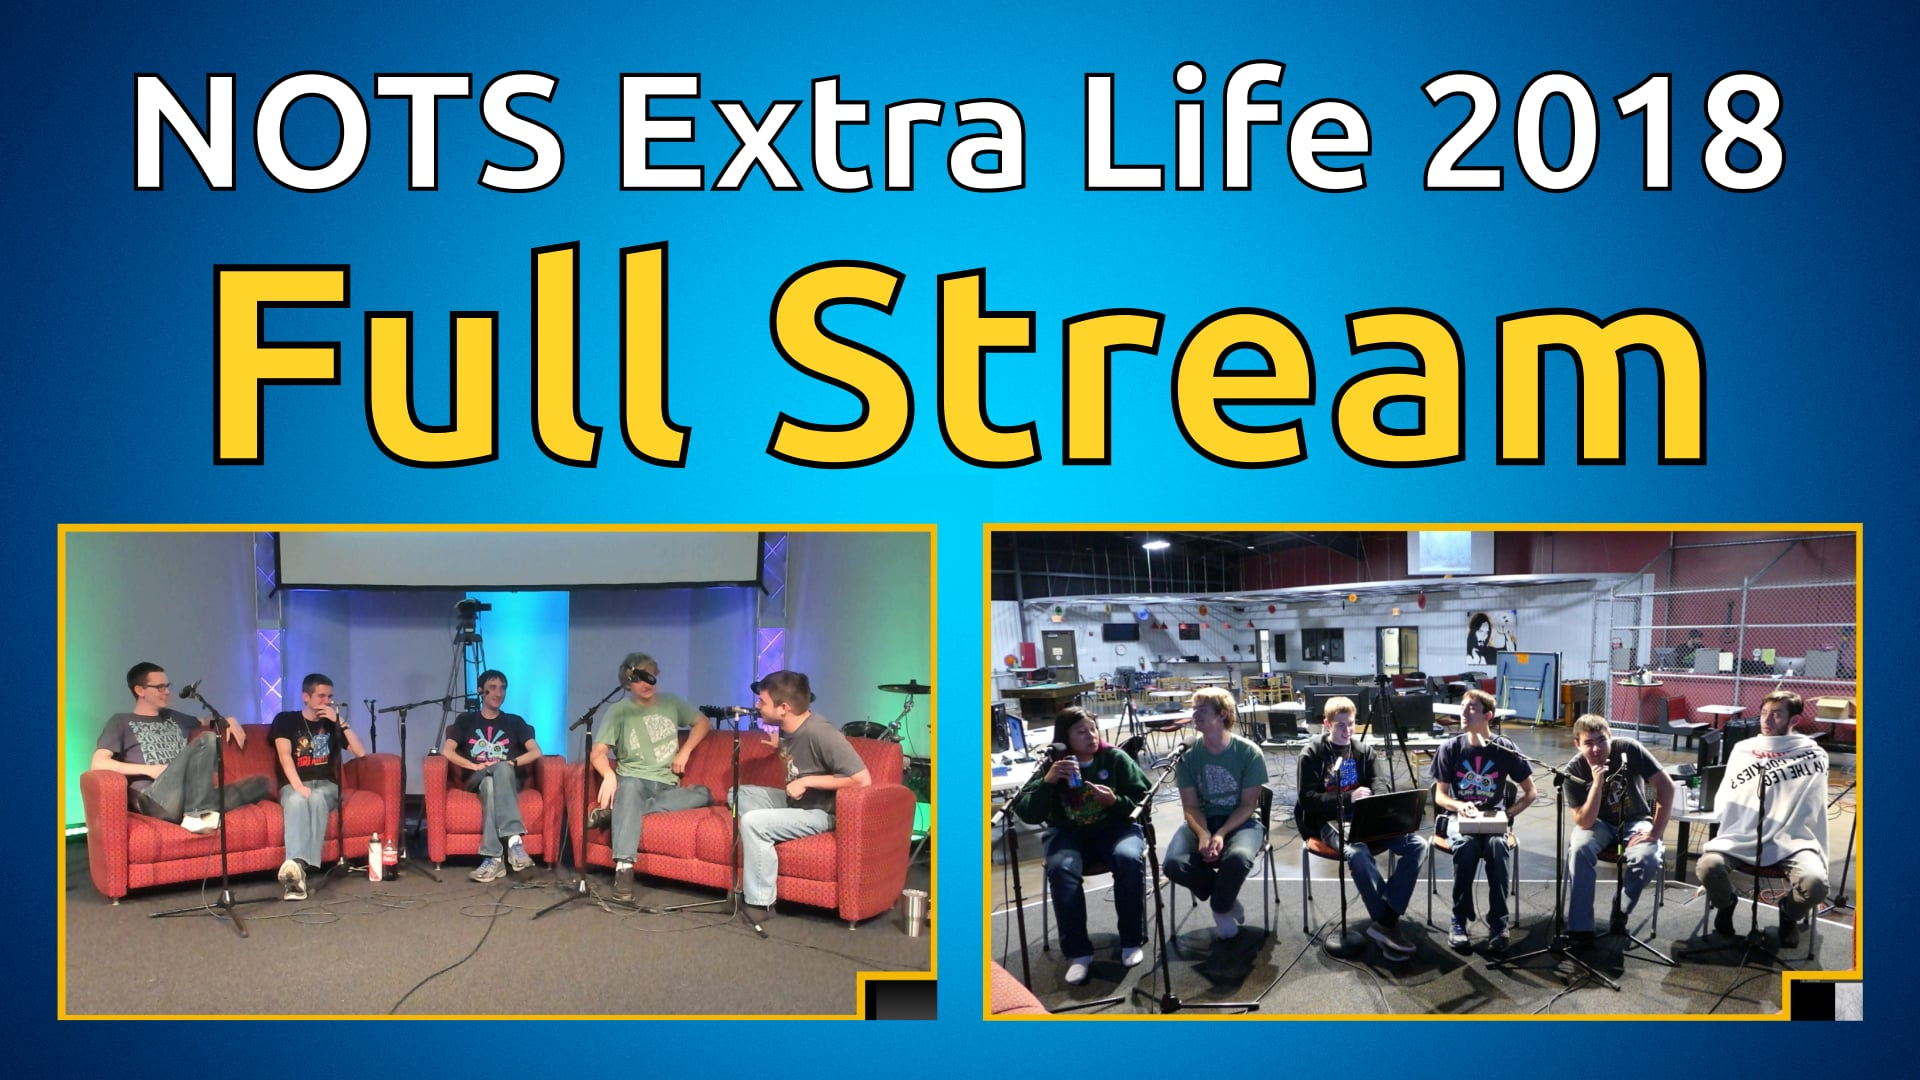 NOTS Extra Life 2018 - Full Stream (Part 1 of 3)